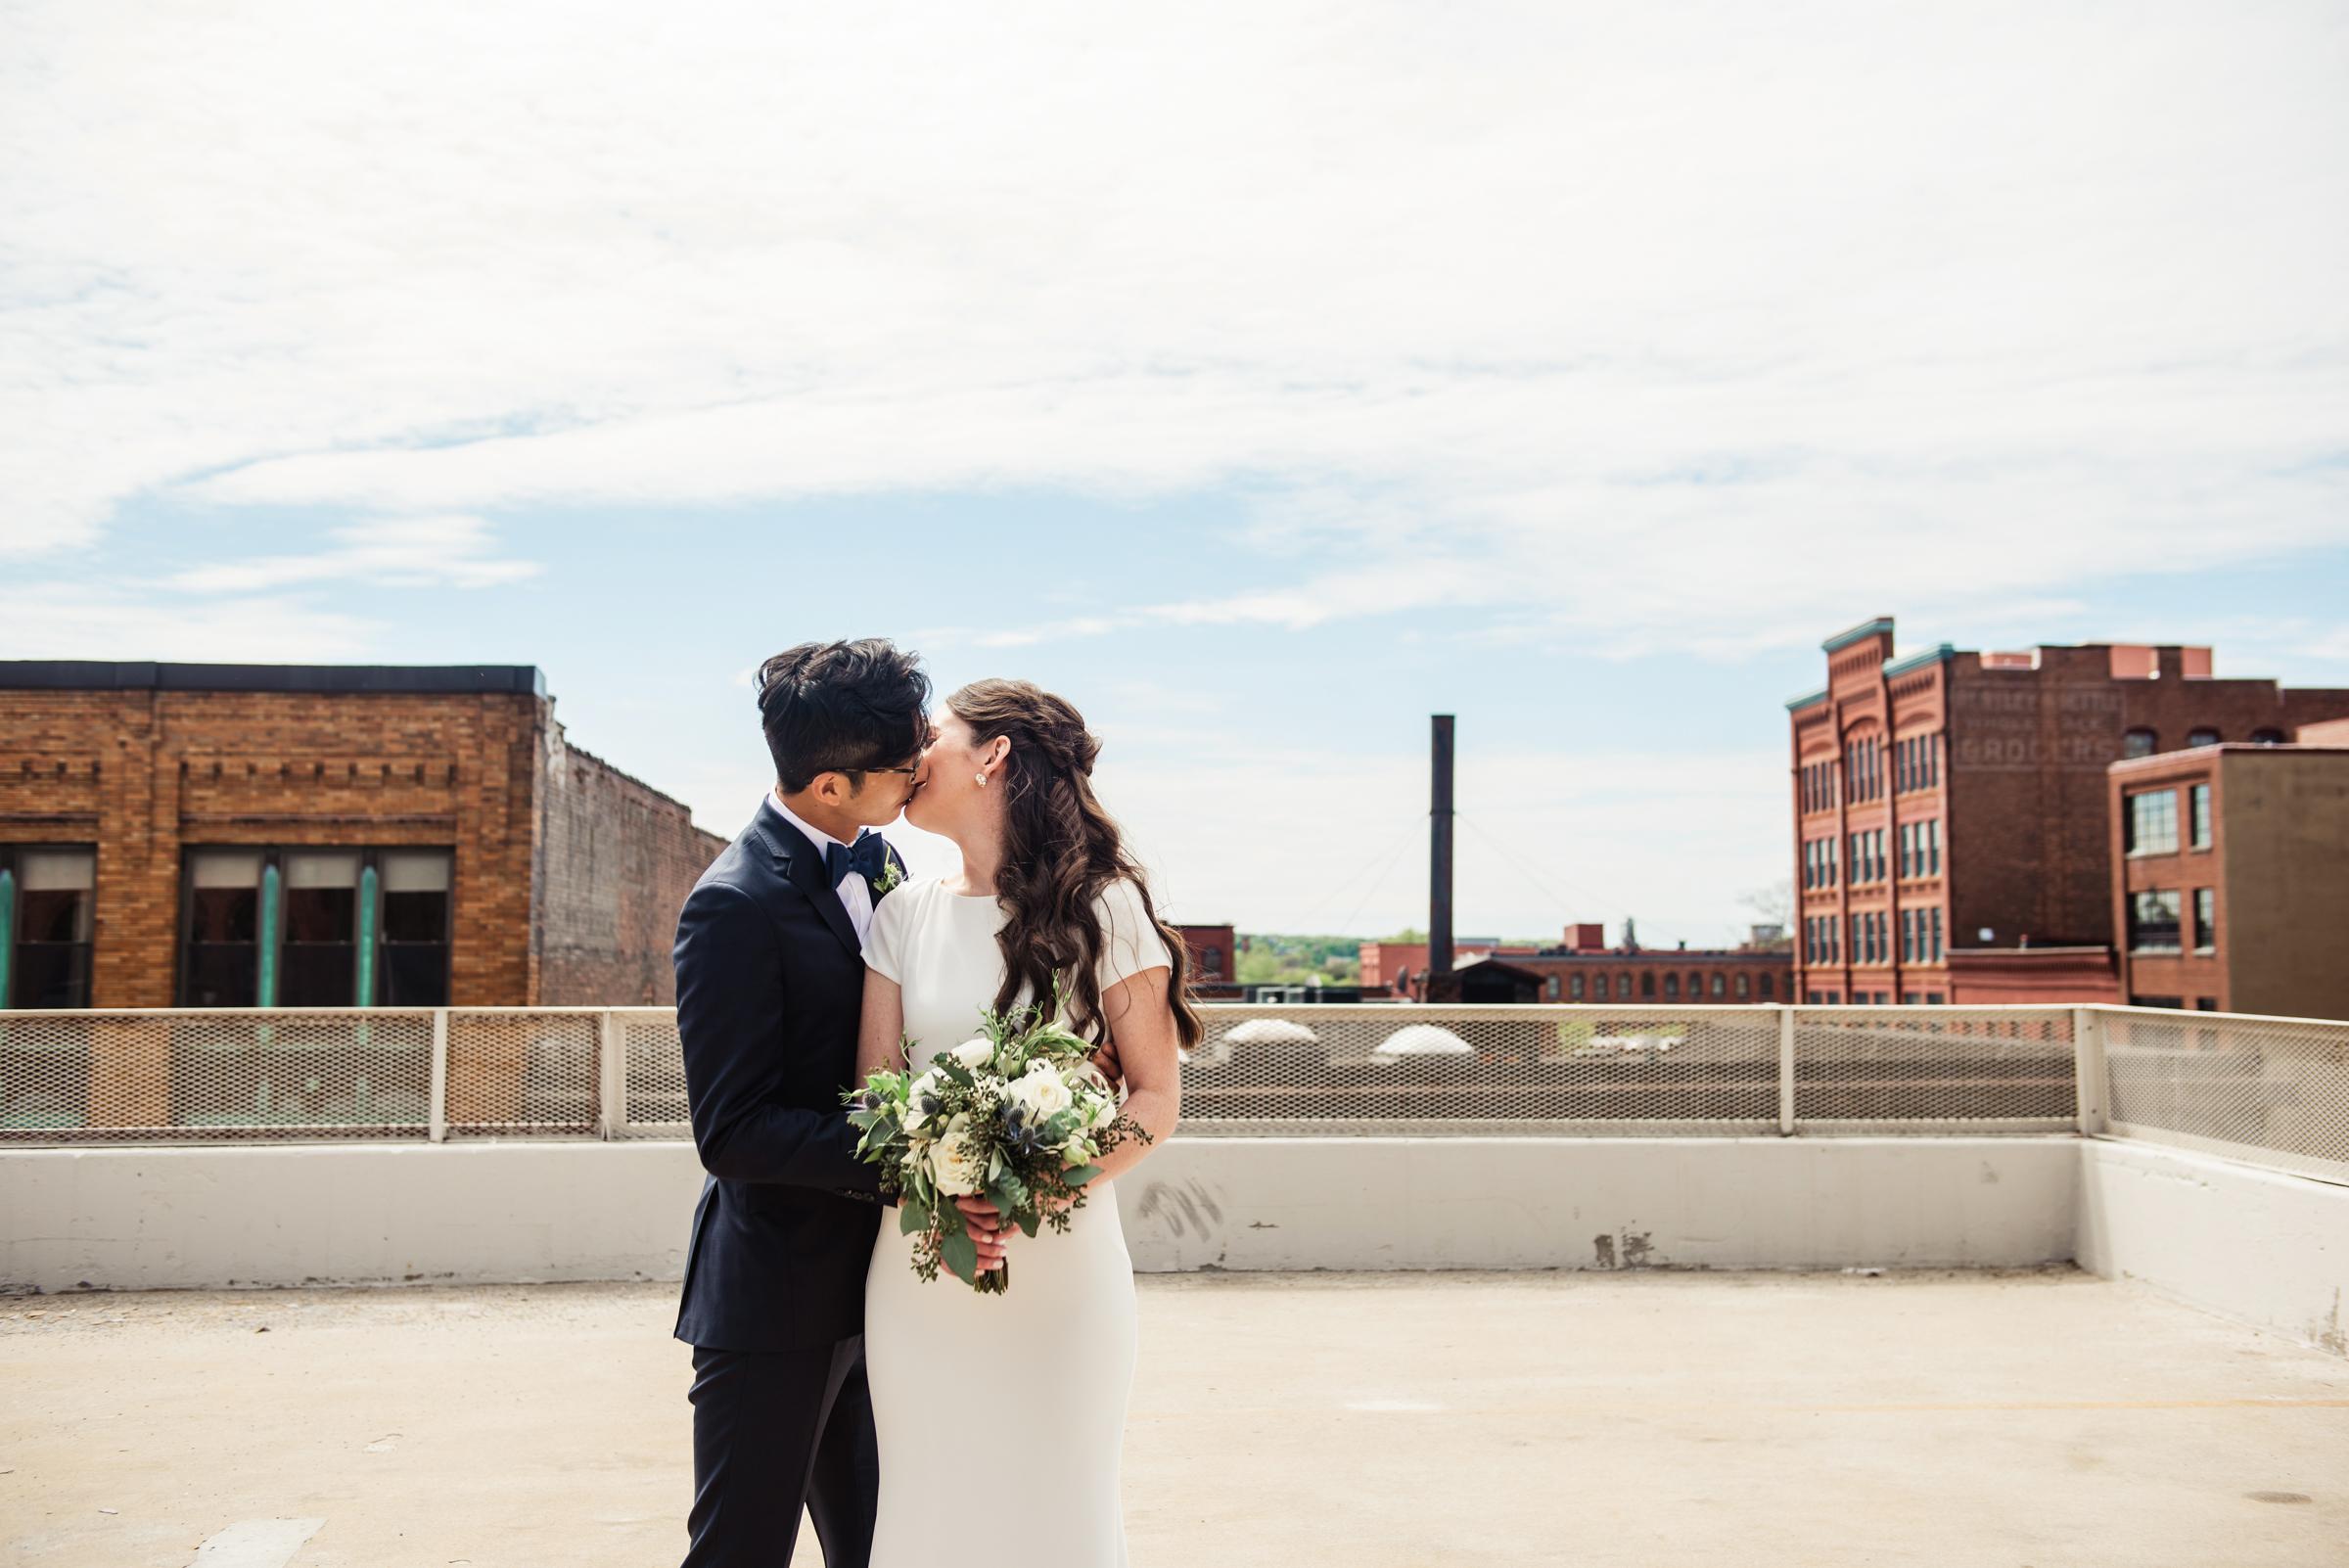 SKY_Armory_Syracuse_Wedding_JILL_STUDIO_Rochester_NY_Photographer_DSC_5295.jpg